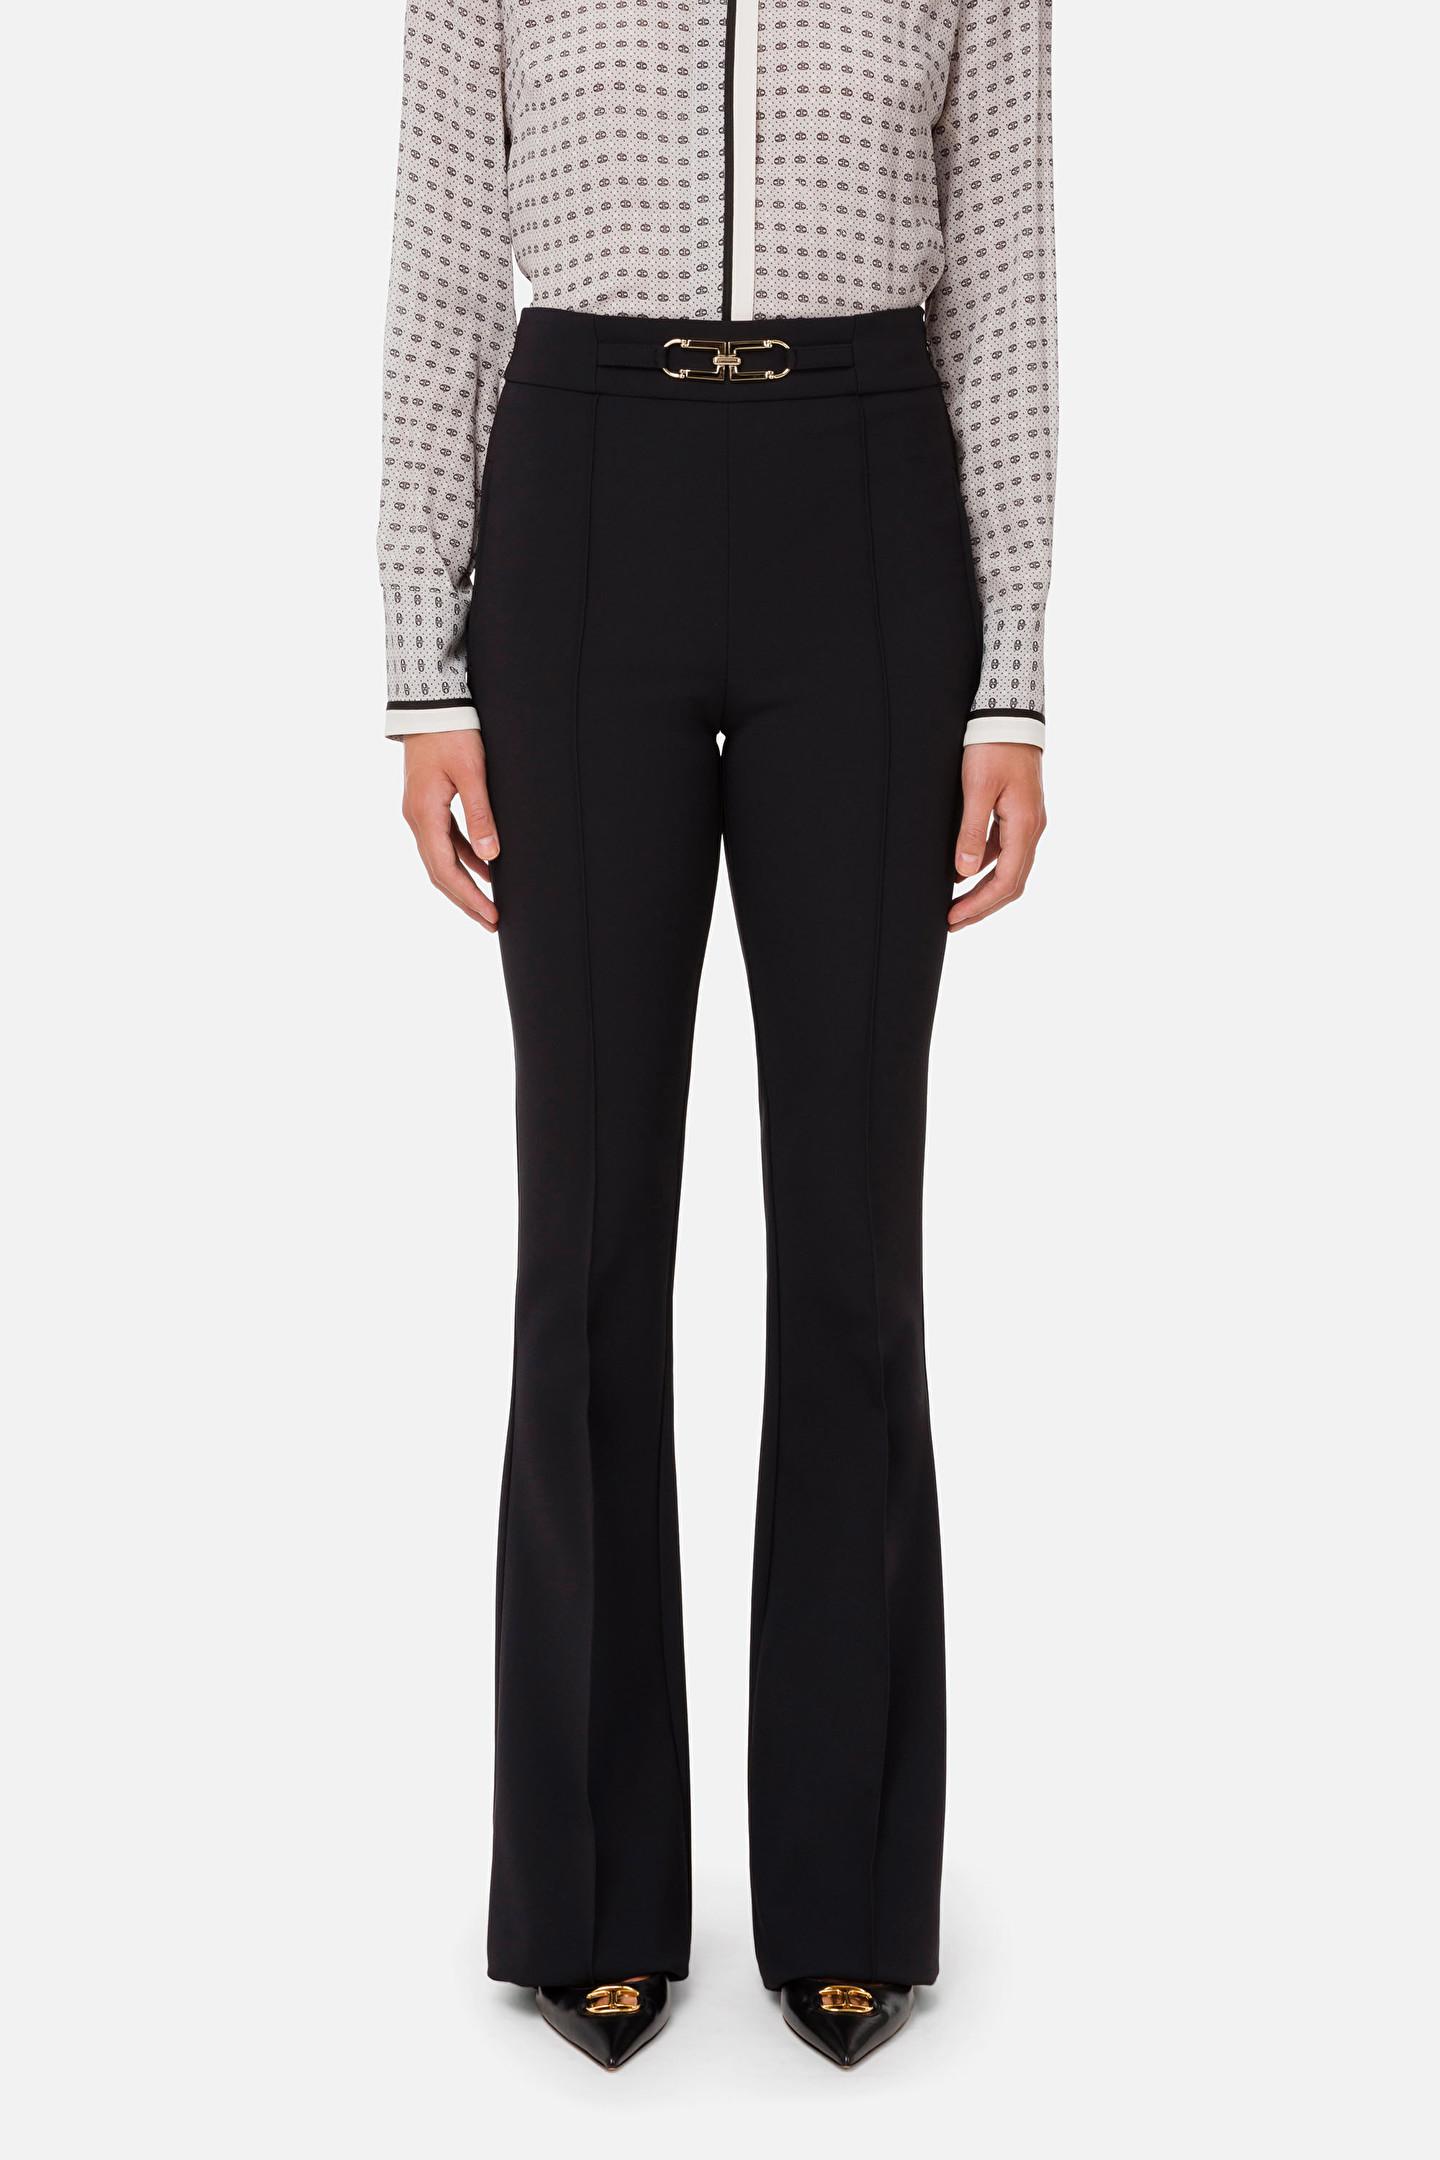 Pantalone donna nero skinny Elisabetta Franchi   PA38716E2110